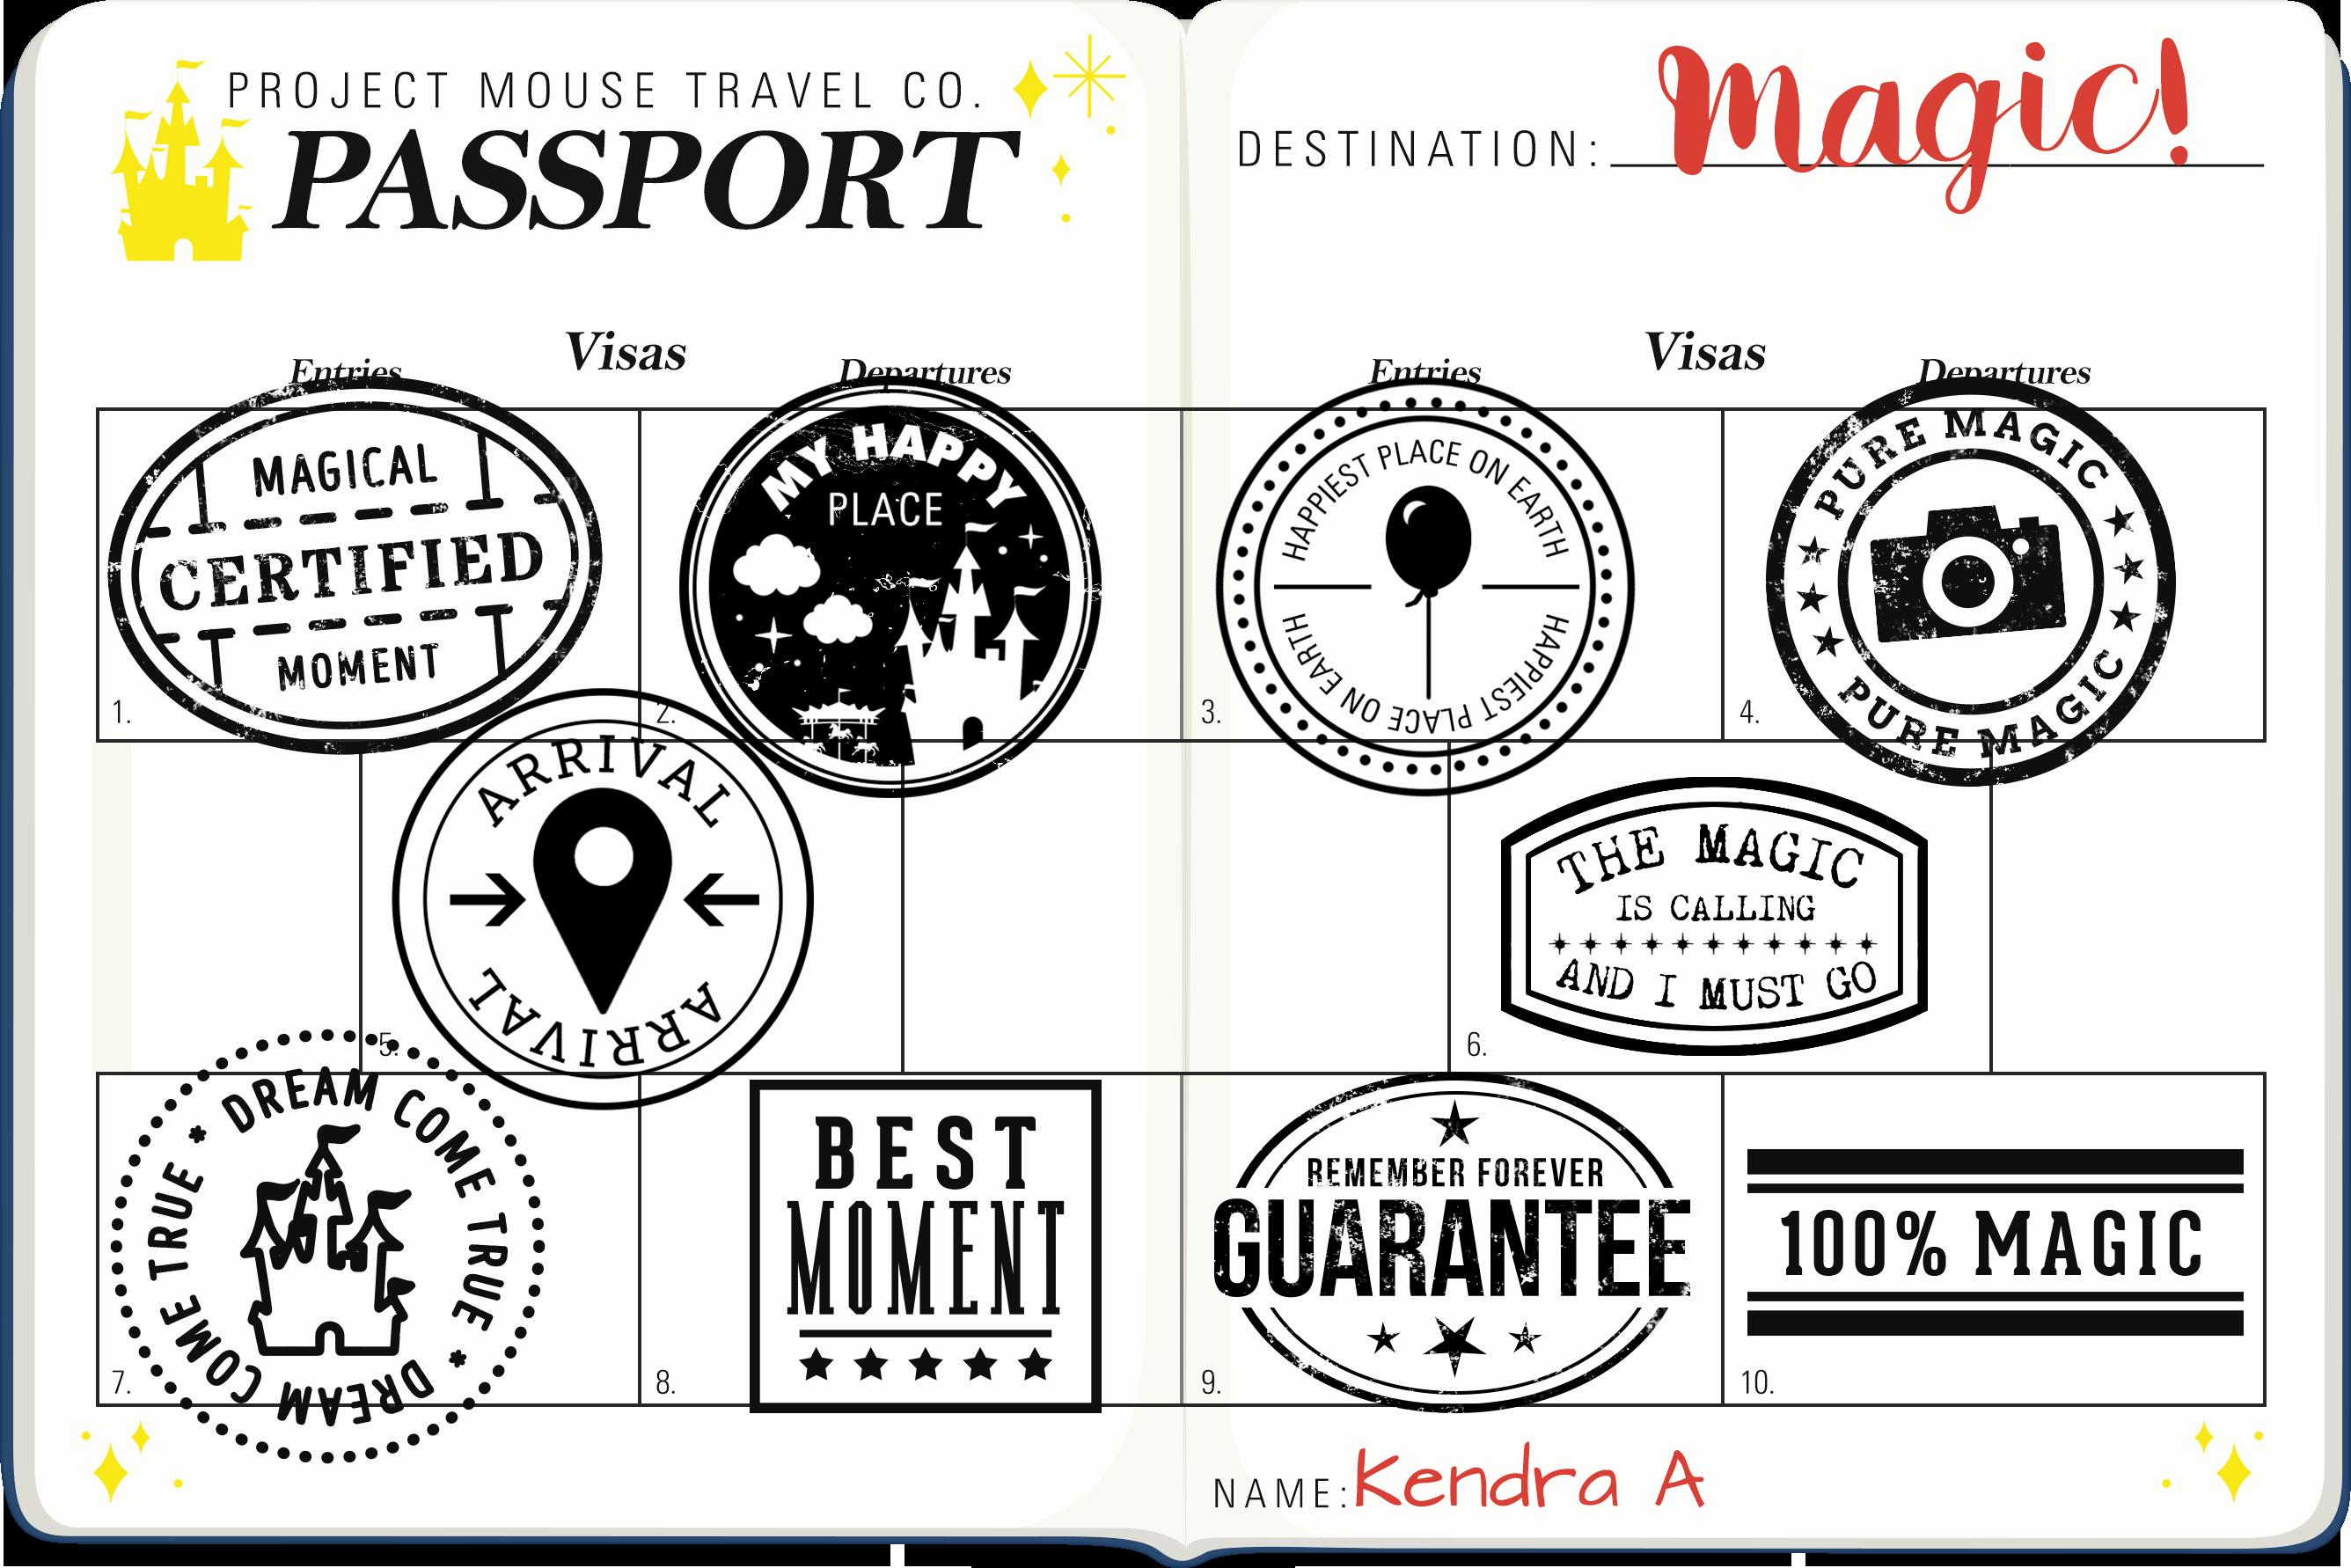 Kendra Aumack - pm_stamps_passport COMPLETE.png